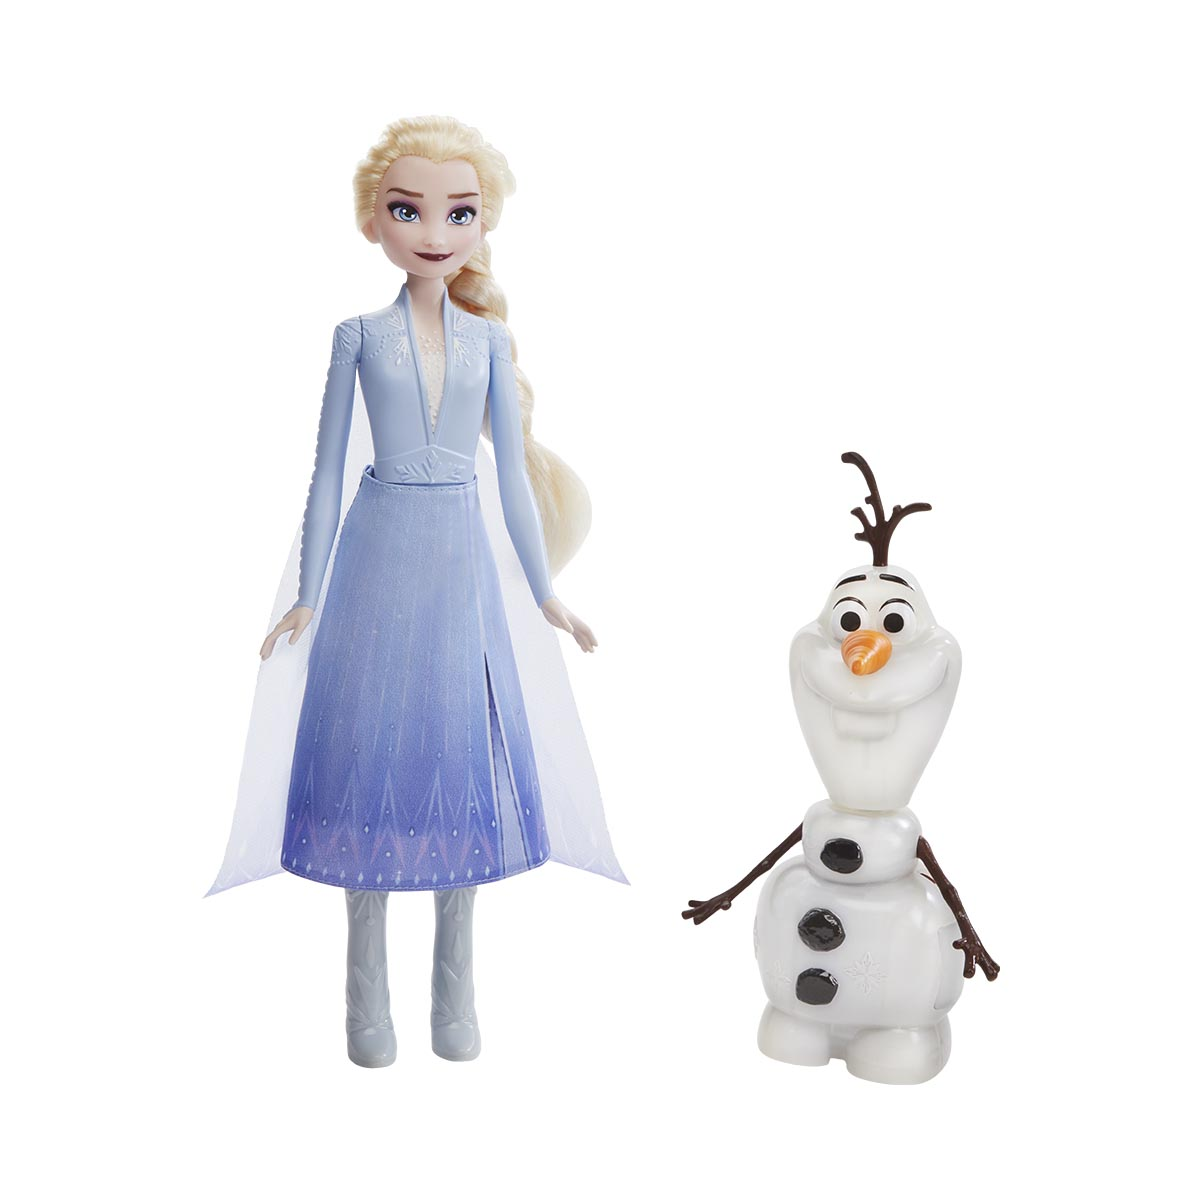 Set 2 papusi interactive Elsa si Olaf Disney Frozen 2